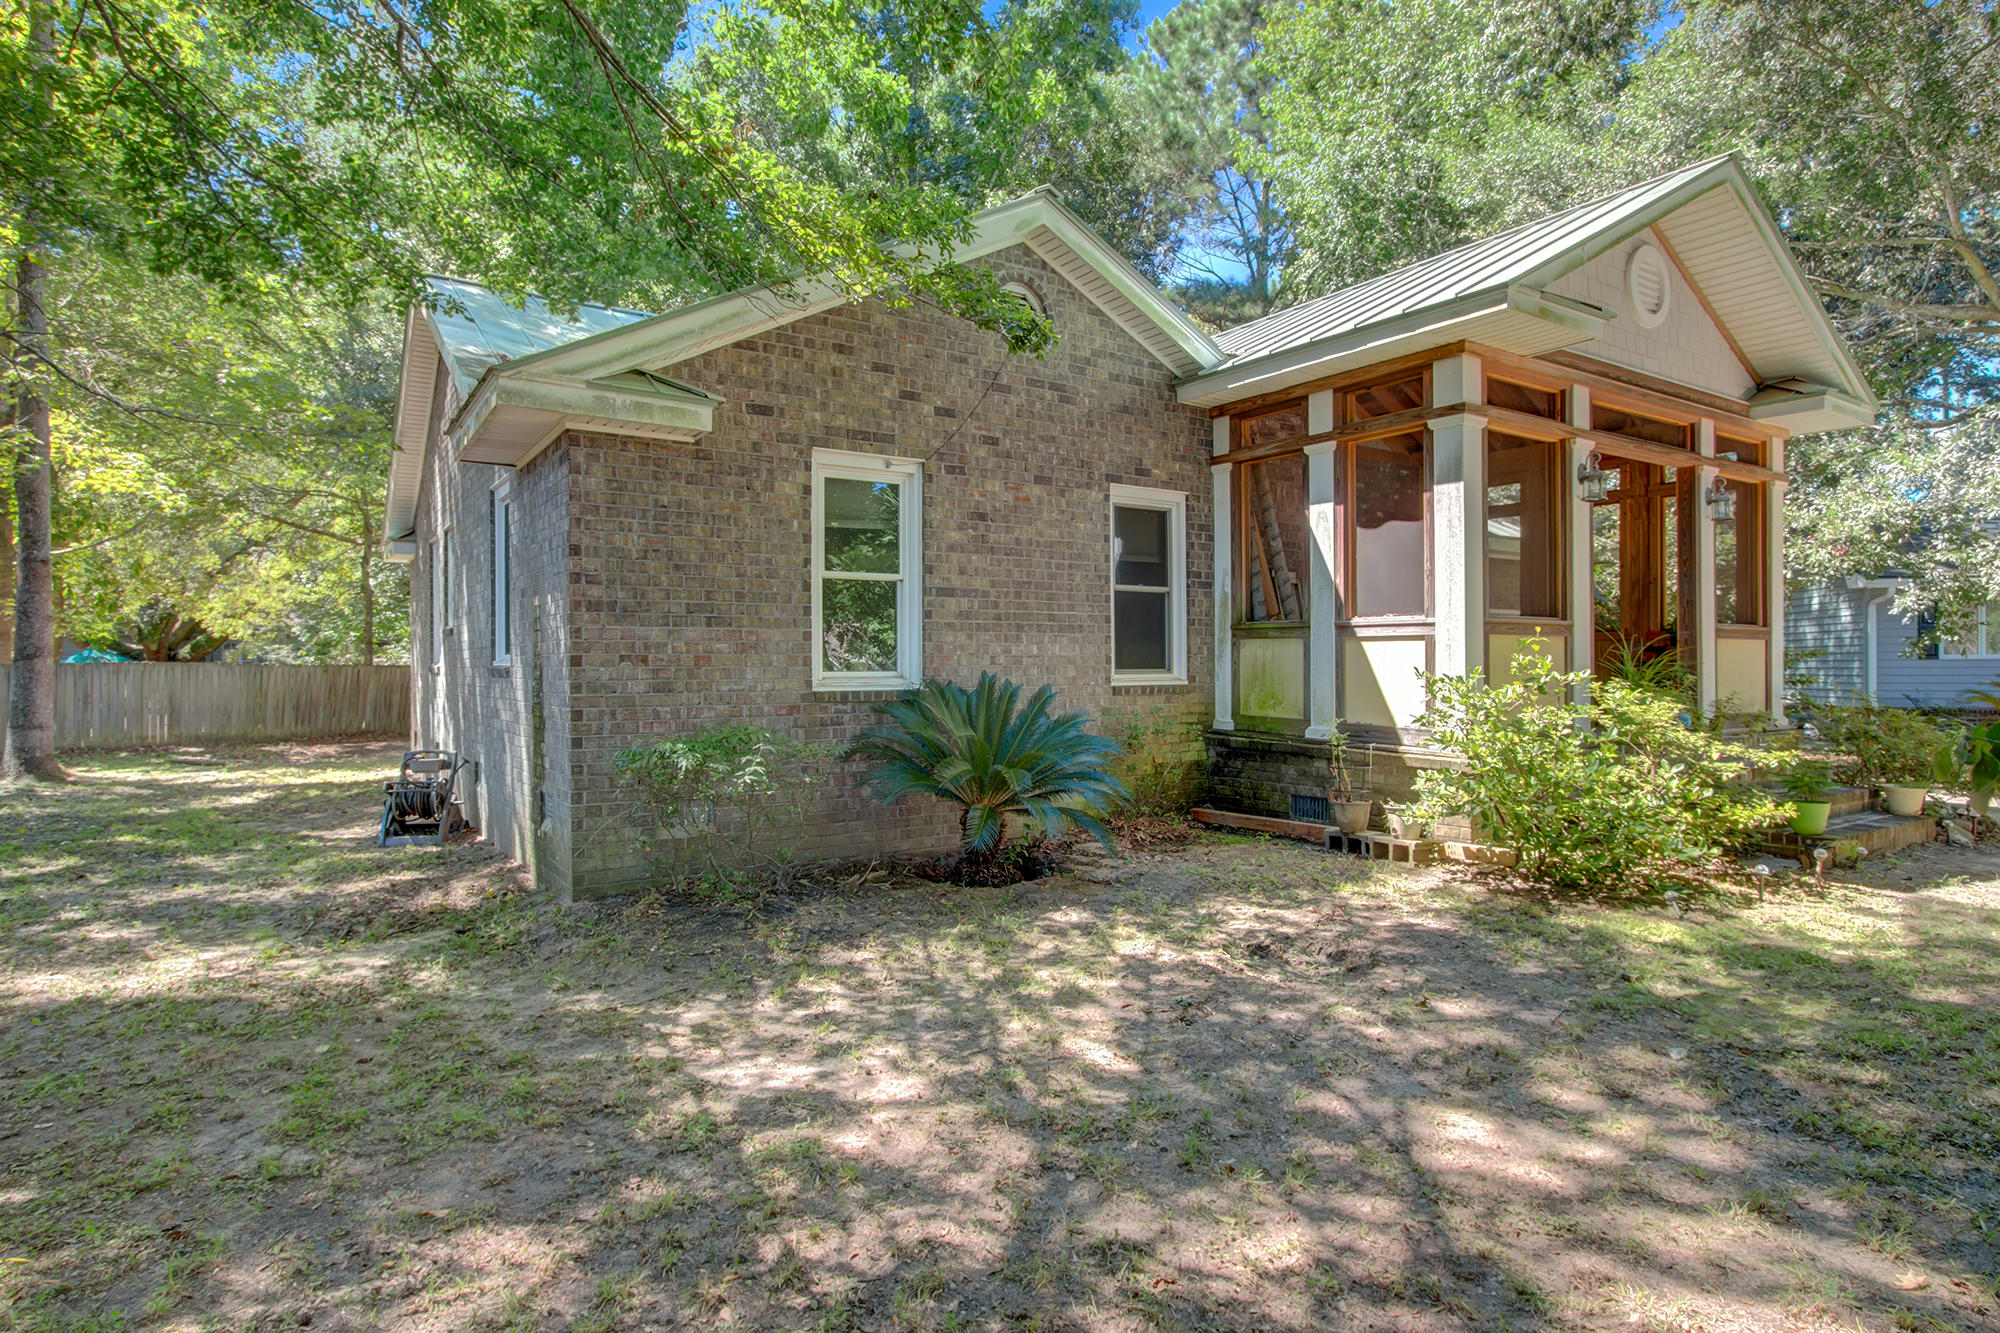 Wando Lakes Homes For Sale - 858 Fairlawn, Mount Pleasant, SC - 5